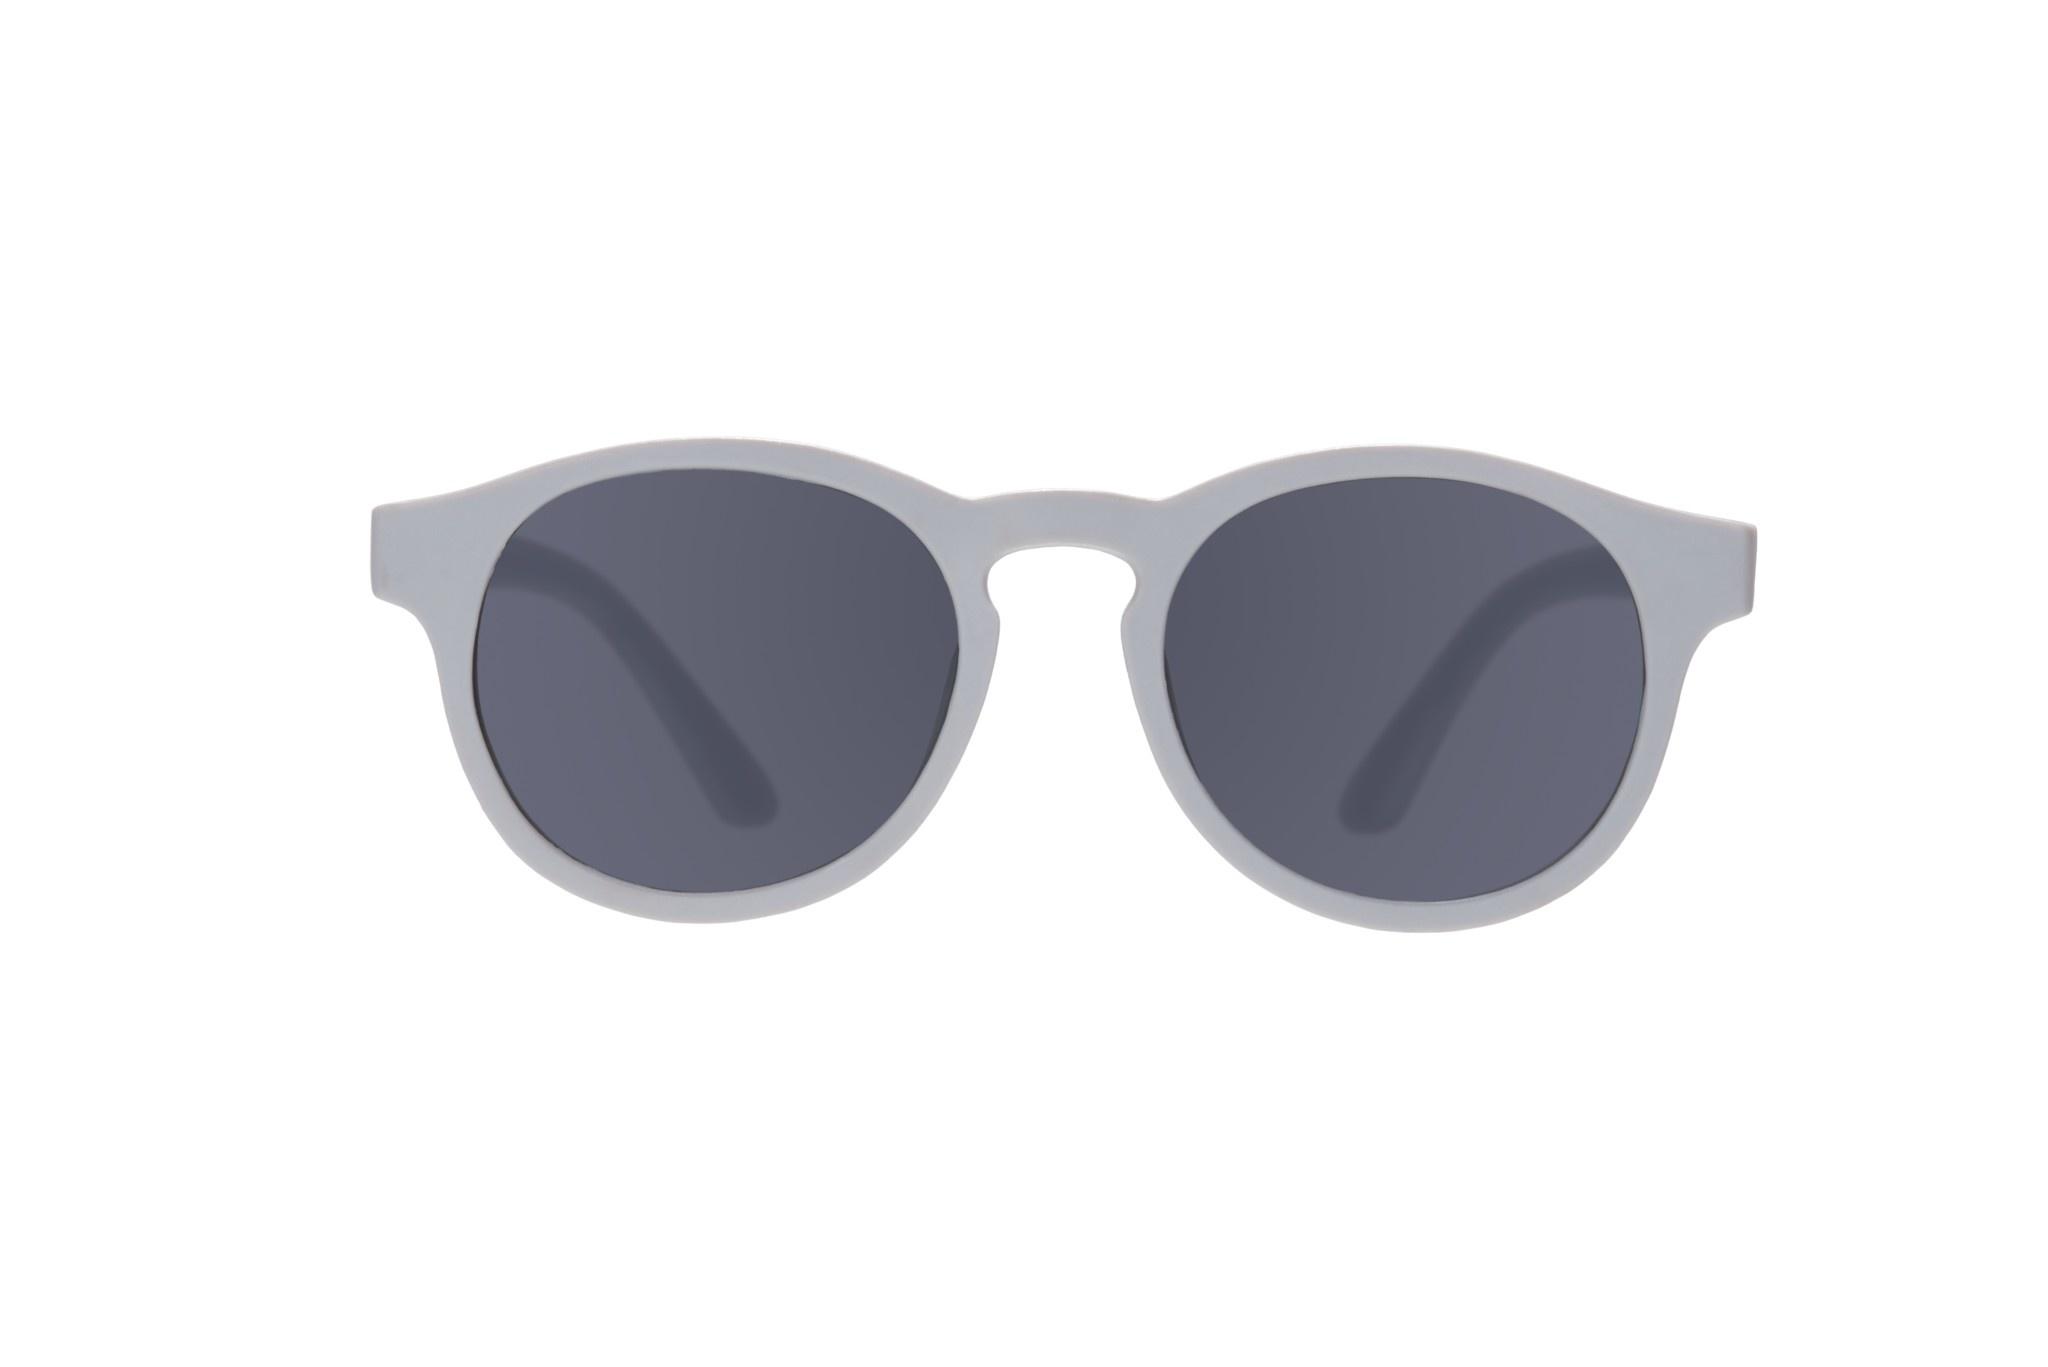 Keyhole Style Sunglasses - Clean Slate